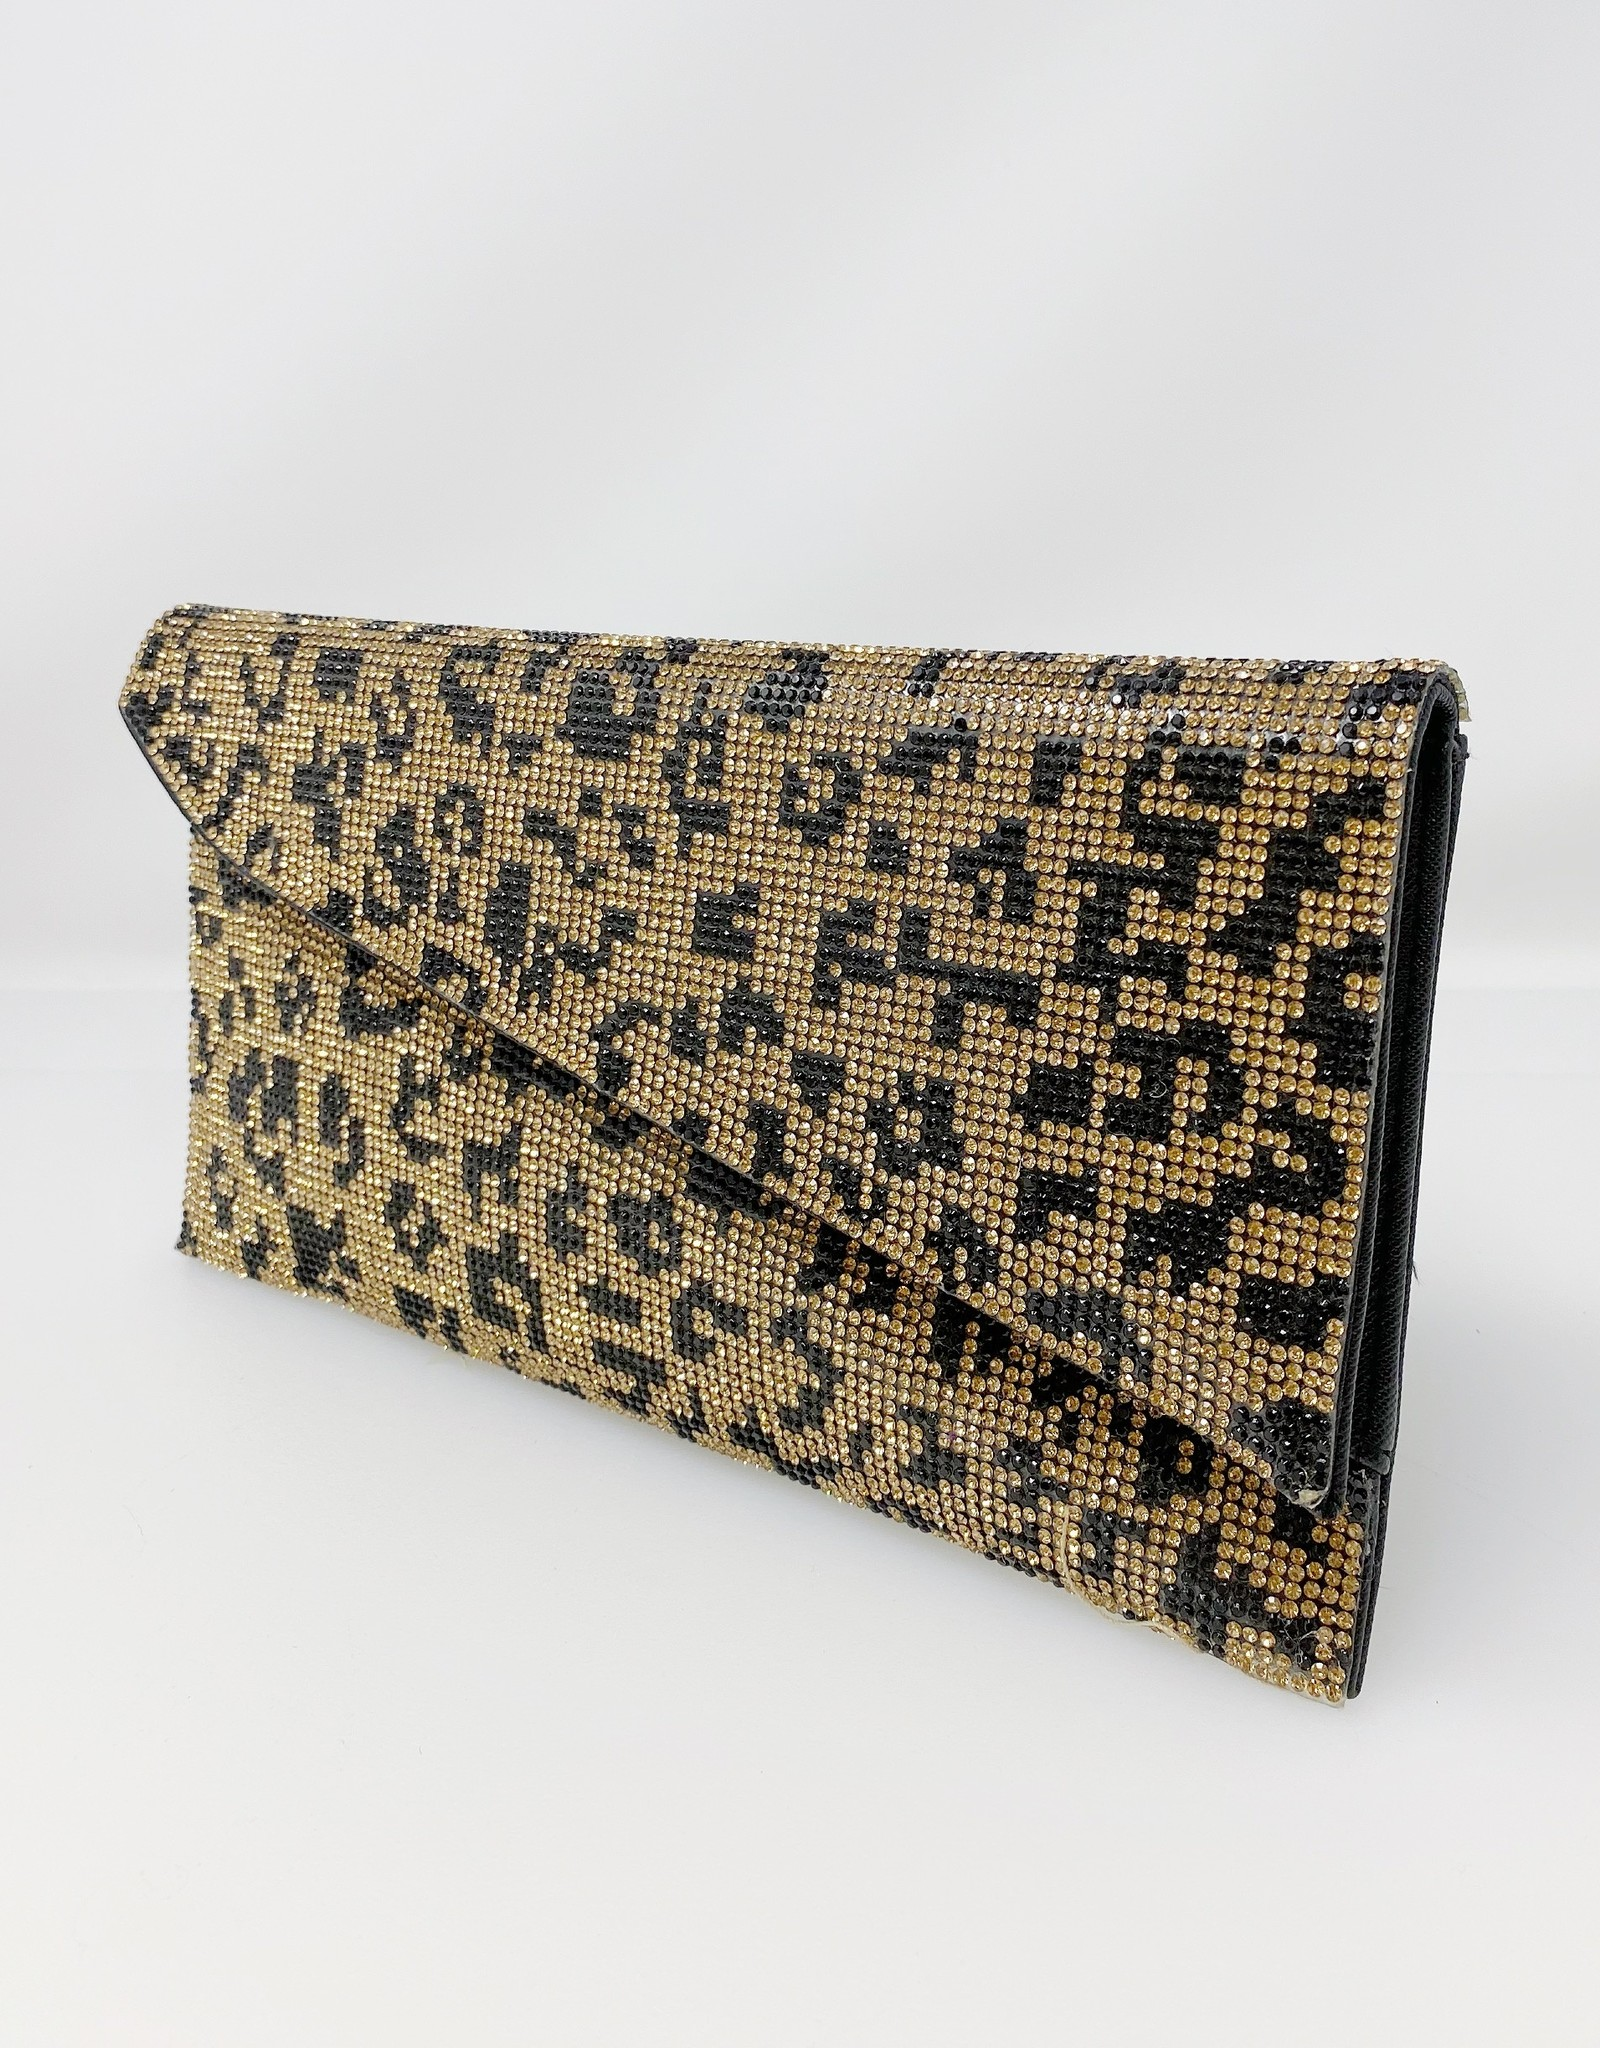 bc handbags Cheetah Stud Clutch